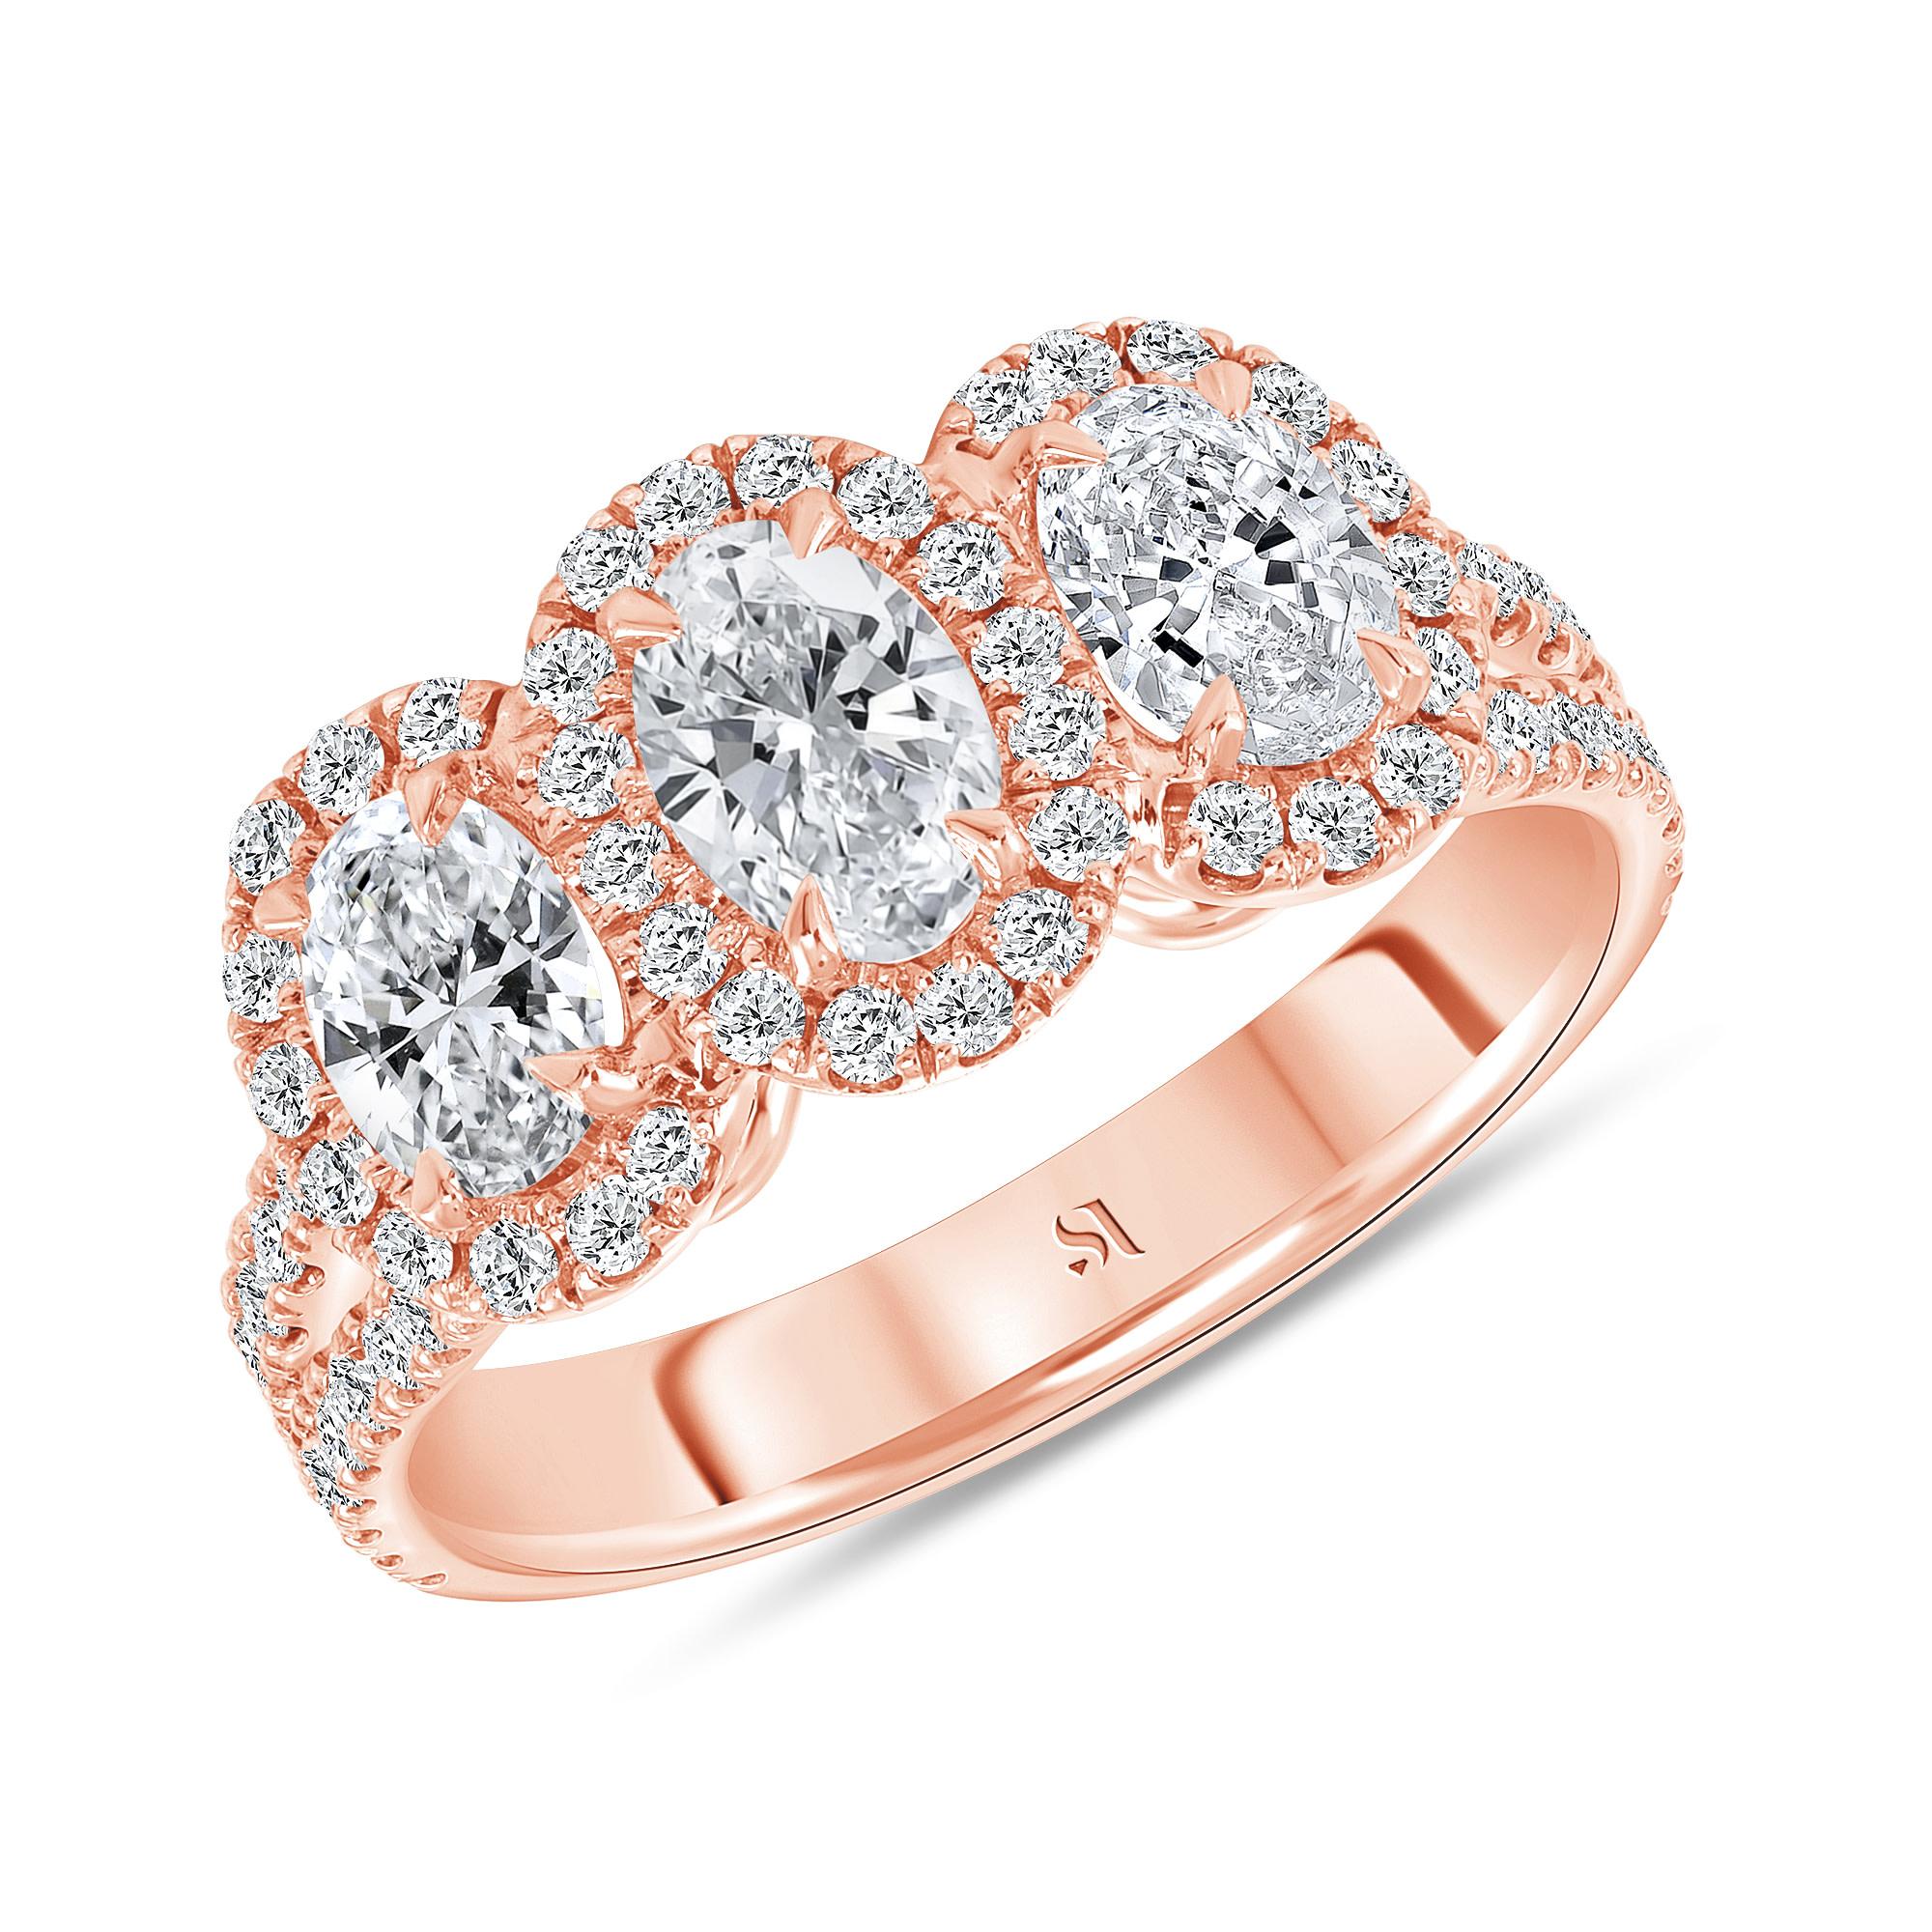 3 stone halo engagement ring rose gold